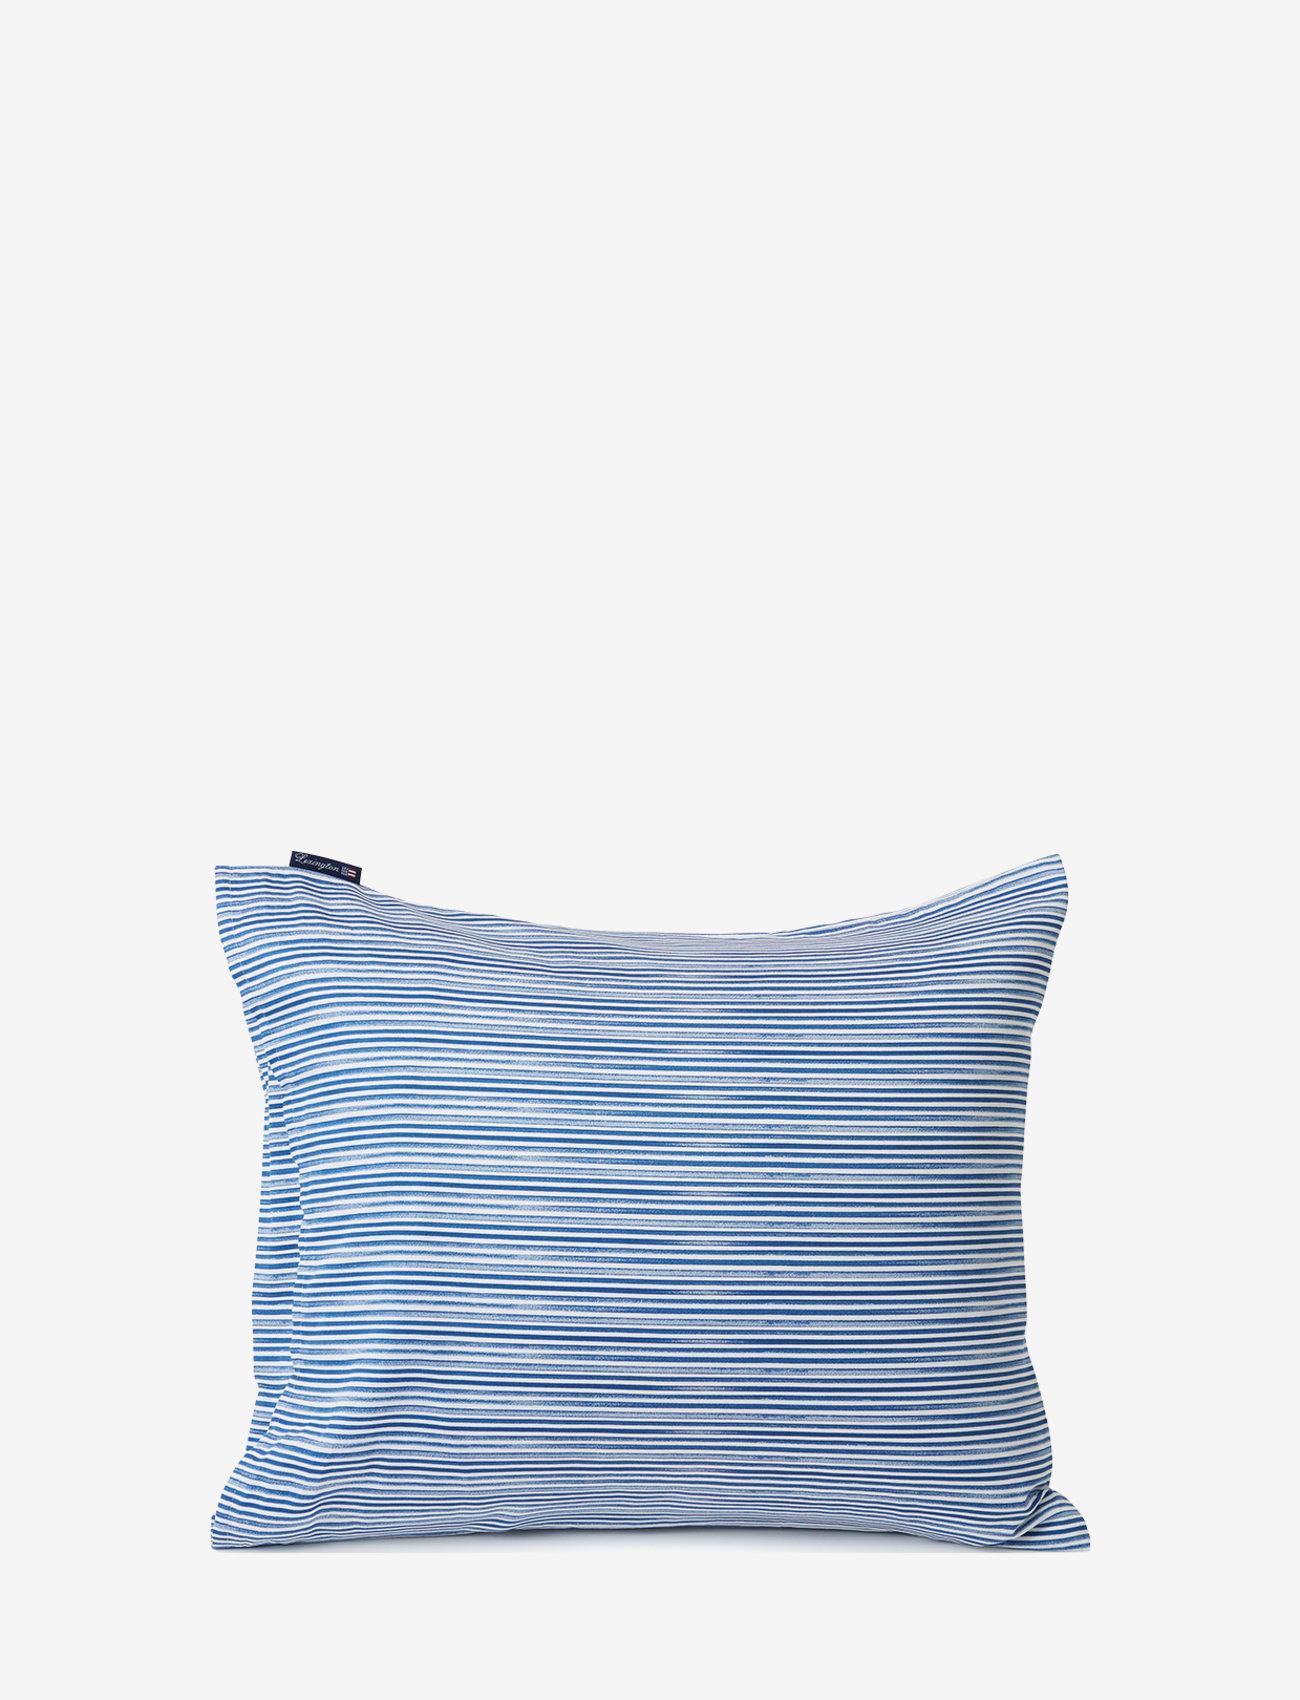 Lexington Home - Blue Striped Organic Cotton Sateen Pillowcase - taies d'oreiller - blue/white - 1